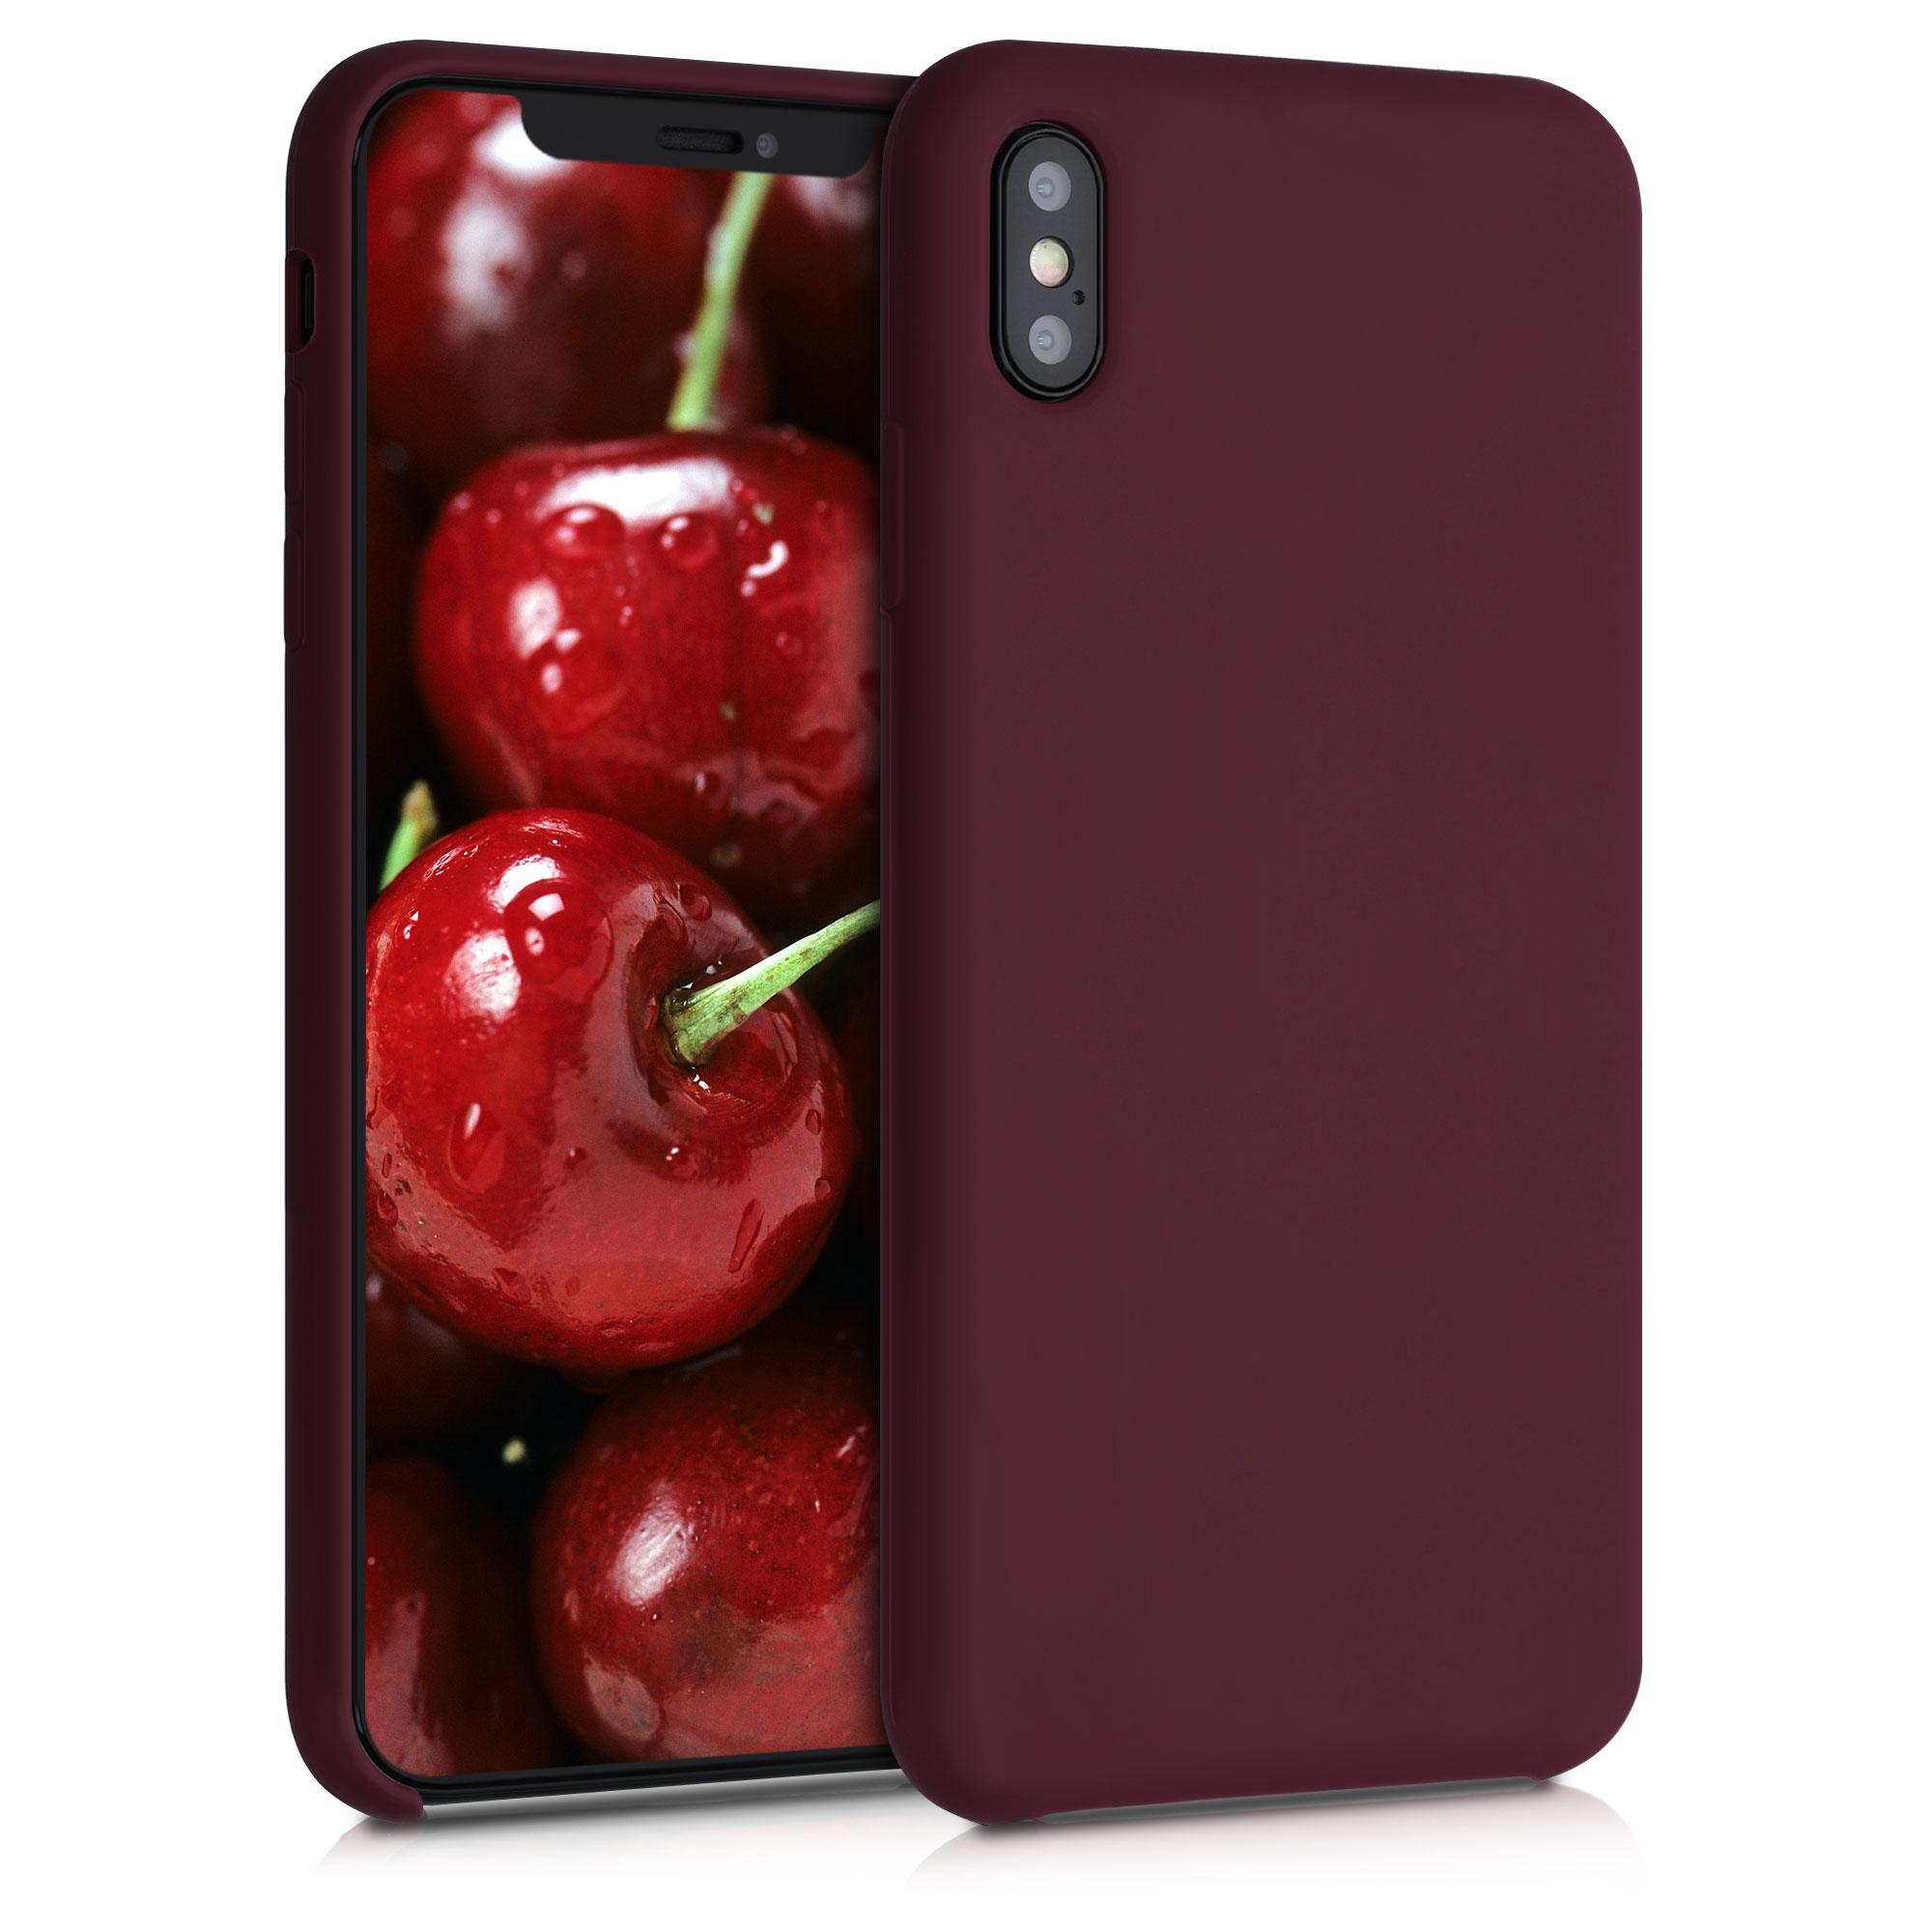 Kvalitní silikonové TPU pouzdro pro Apple iPhone XS Max - Tawny Red